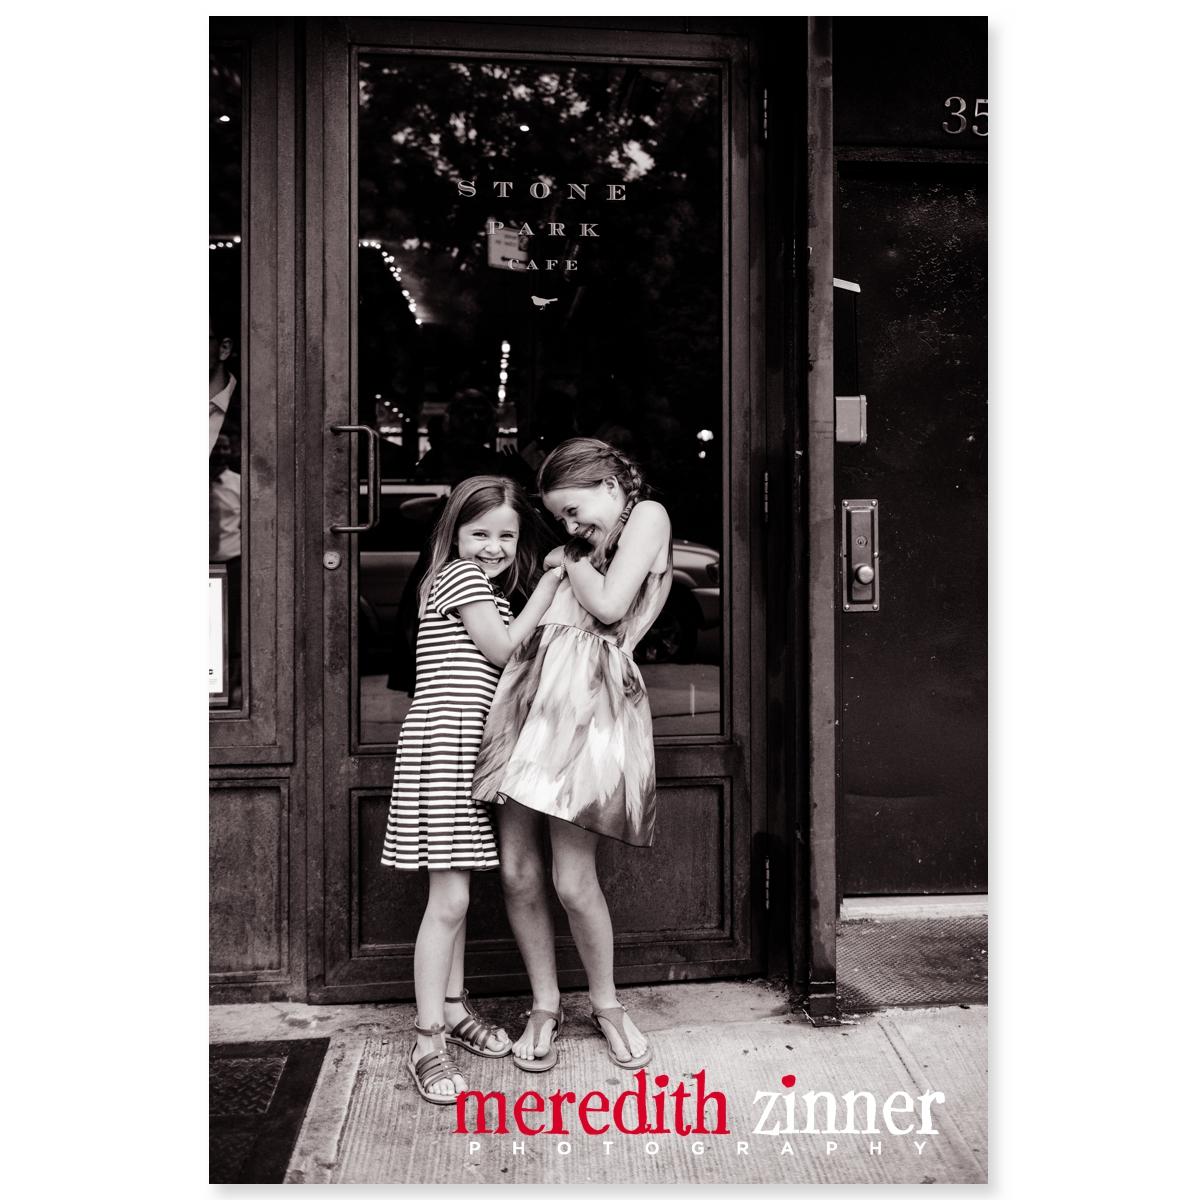 Meredith_Zinner_Photography_StilesCelebration_0037